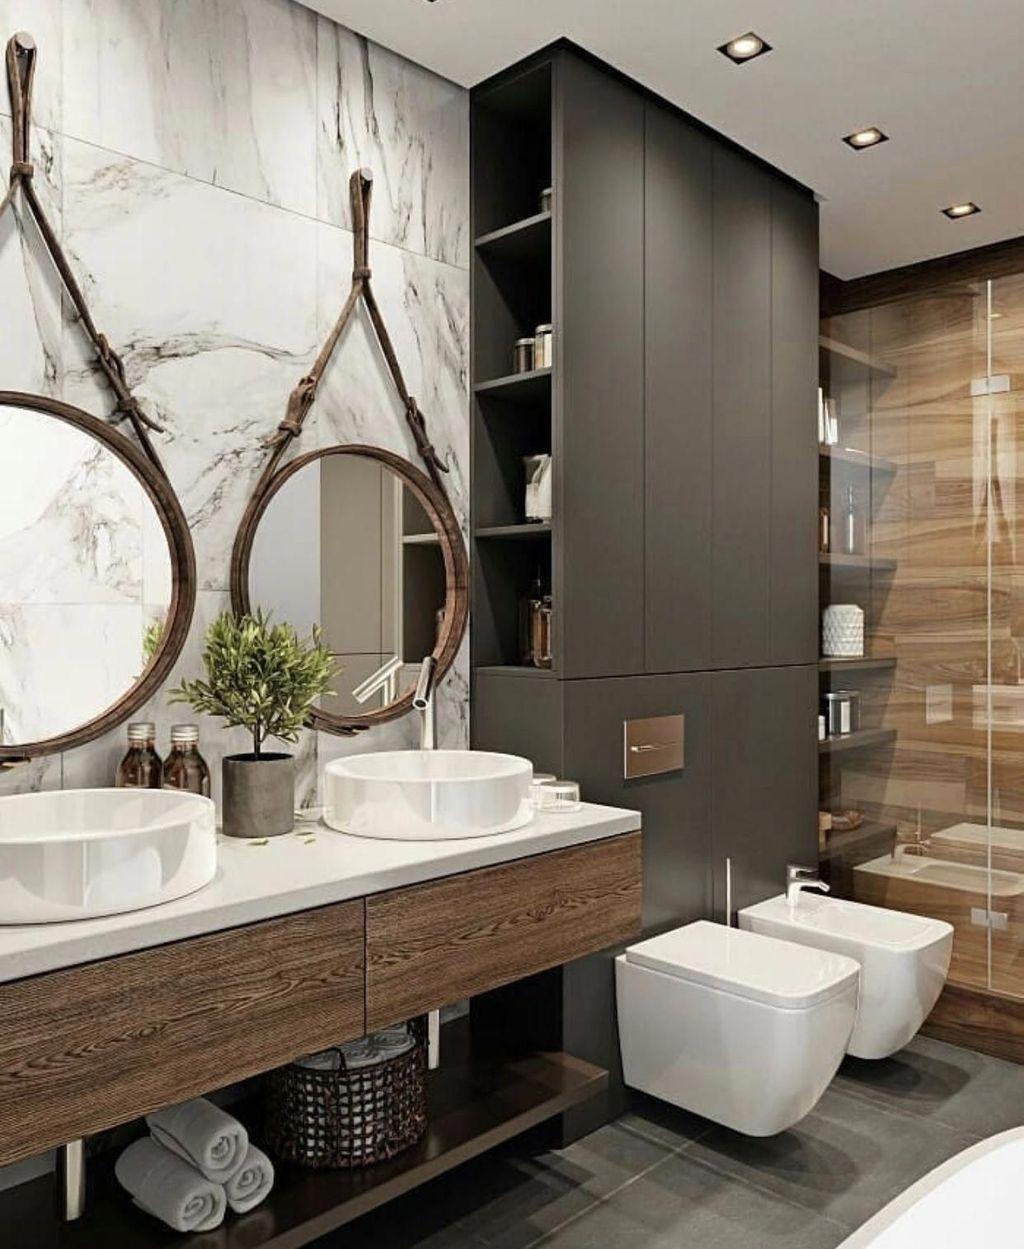 32 Stunning Industrial Bathroom Design Ideas Industrial Style Bathroom Industrial Bathroom Design Industrial Bathroom Decor